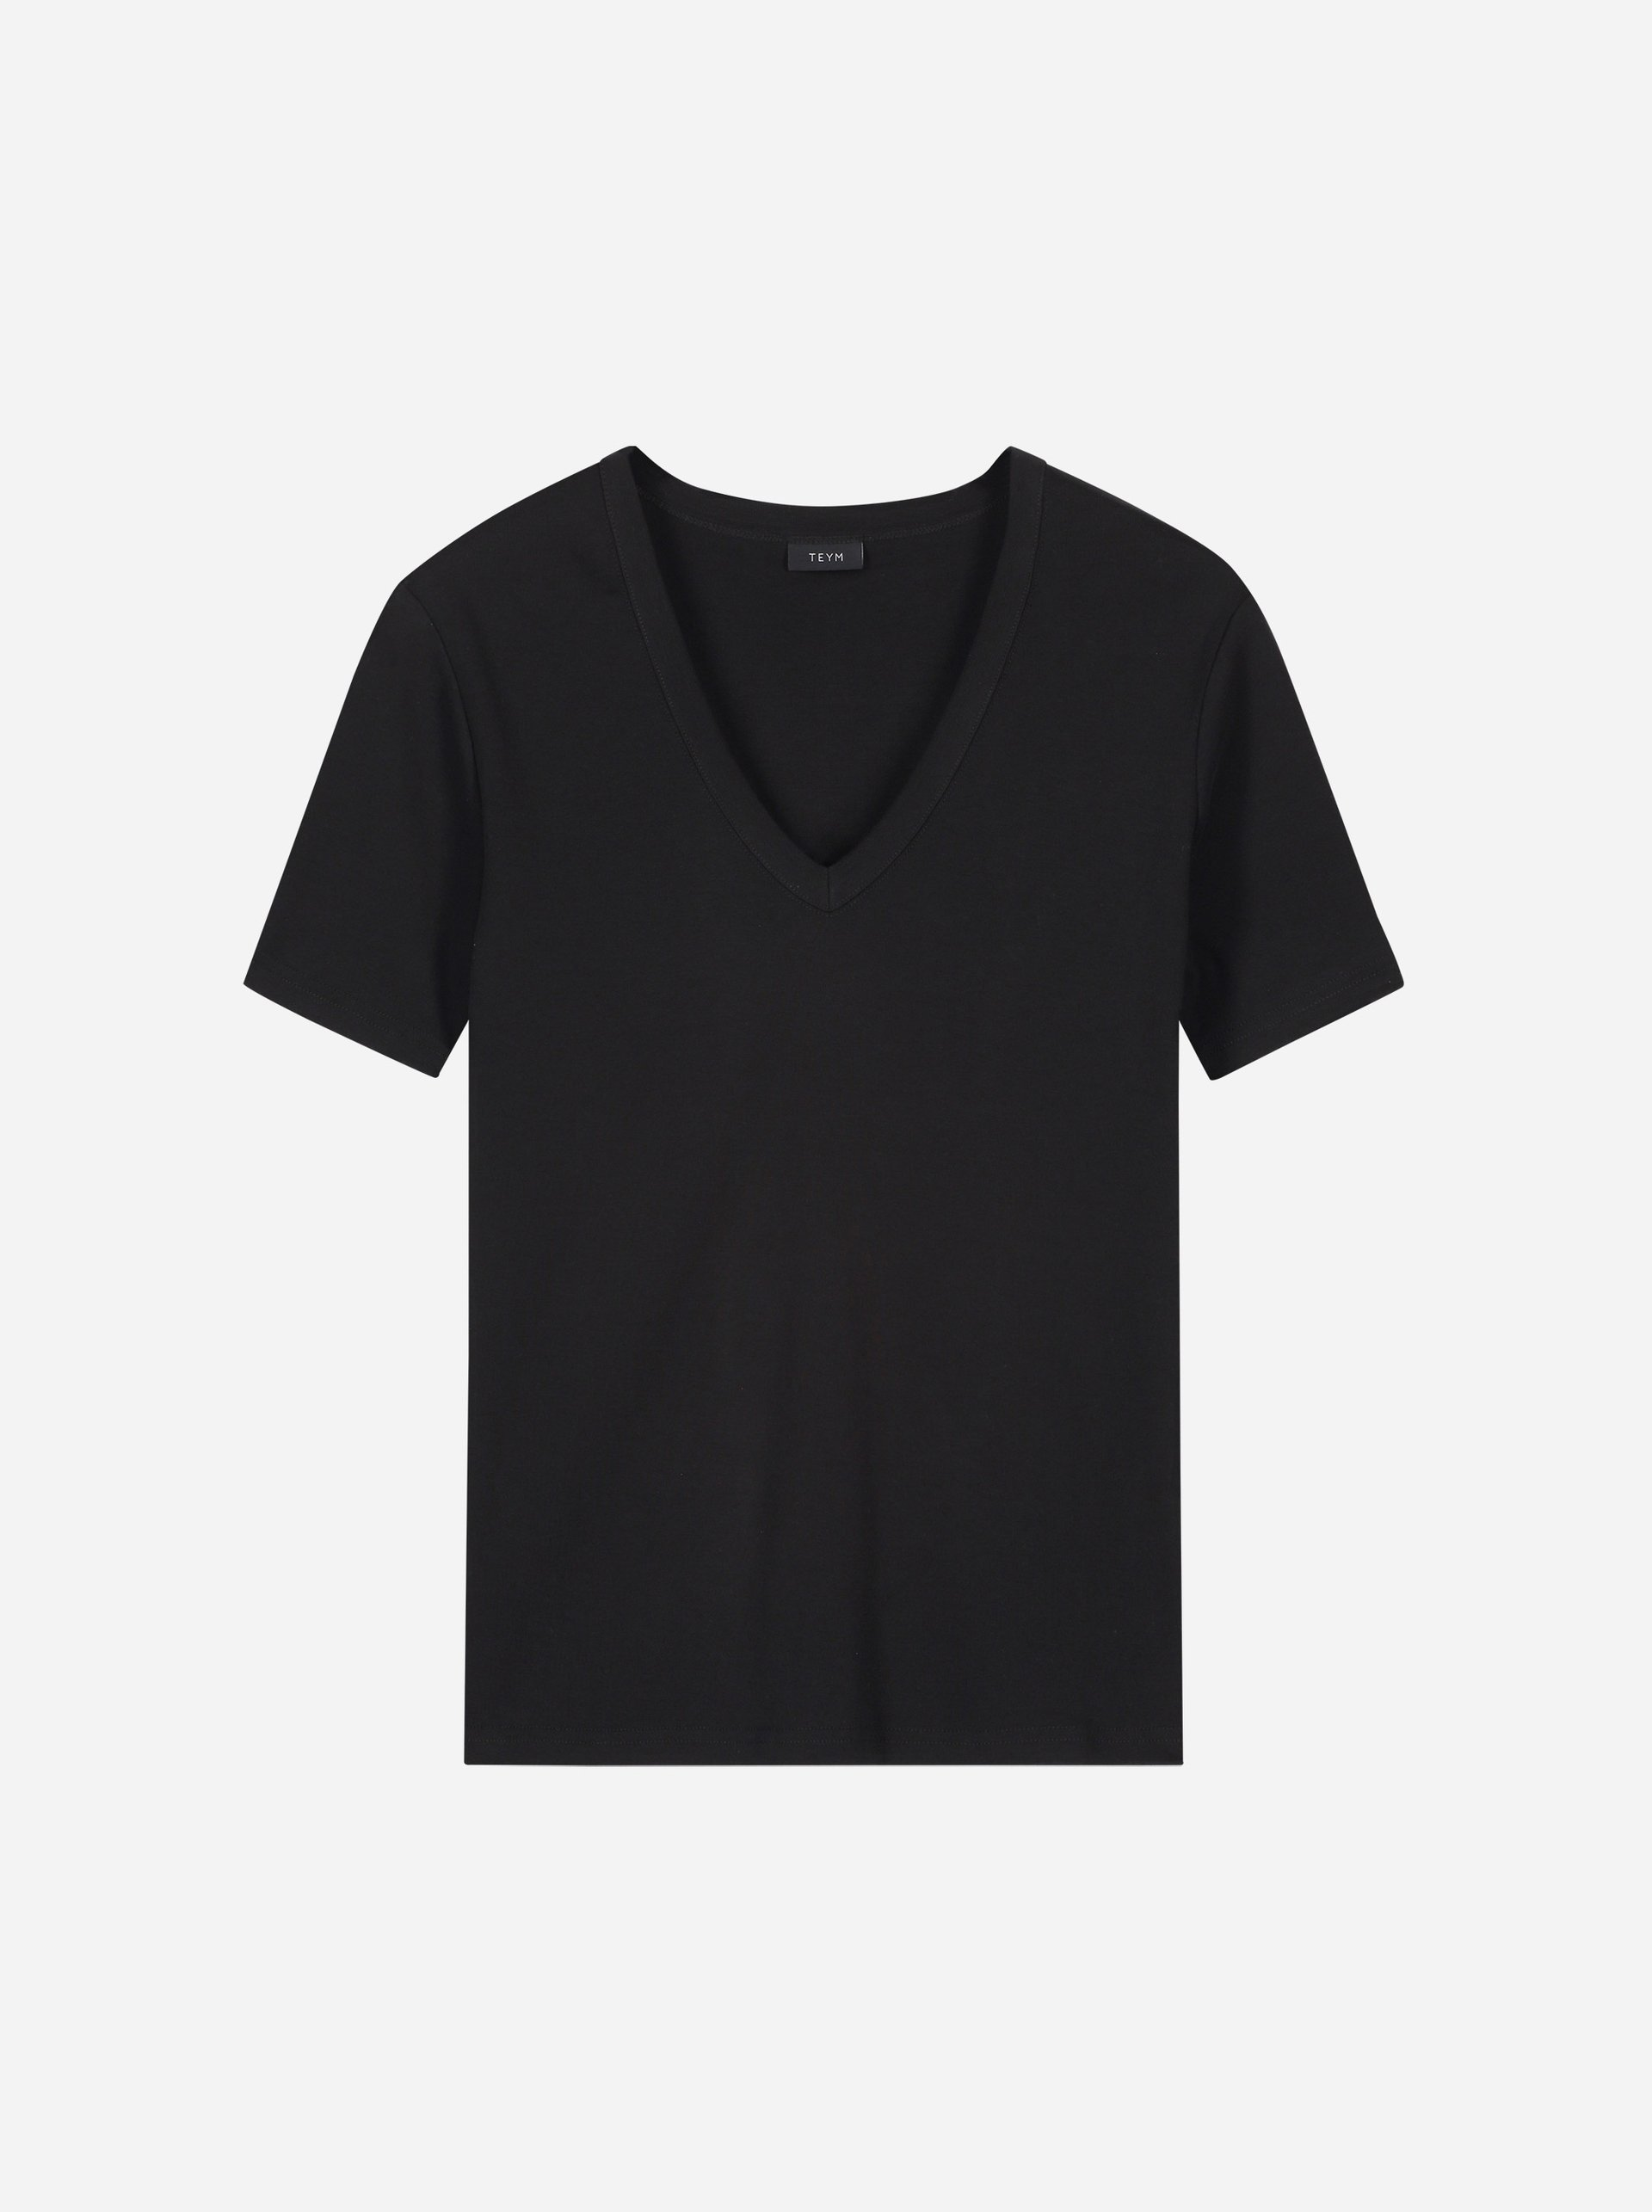 Teym - The T-Shirt - V-Neck - Women - Black - 7